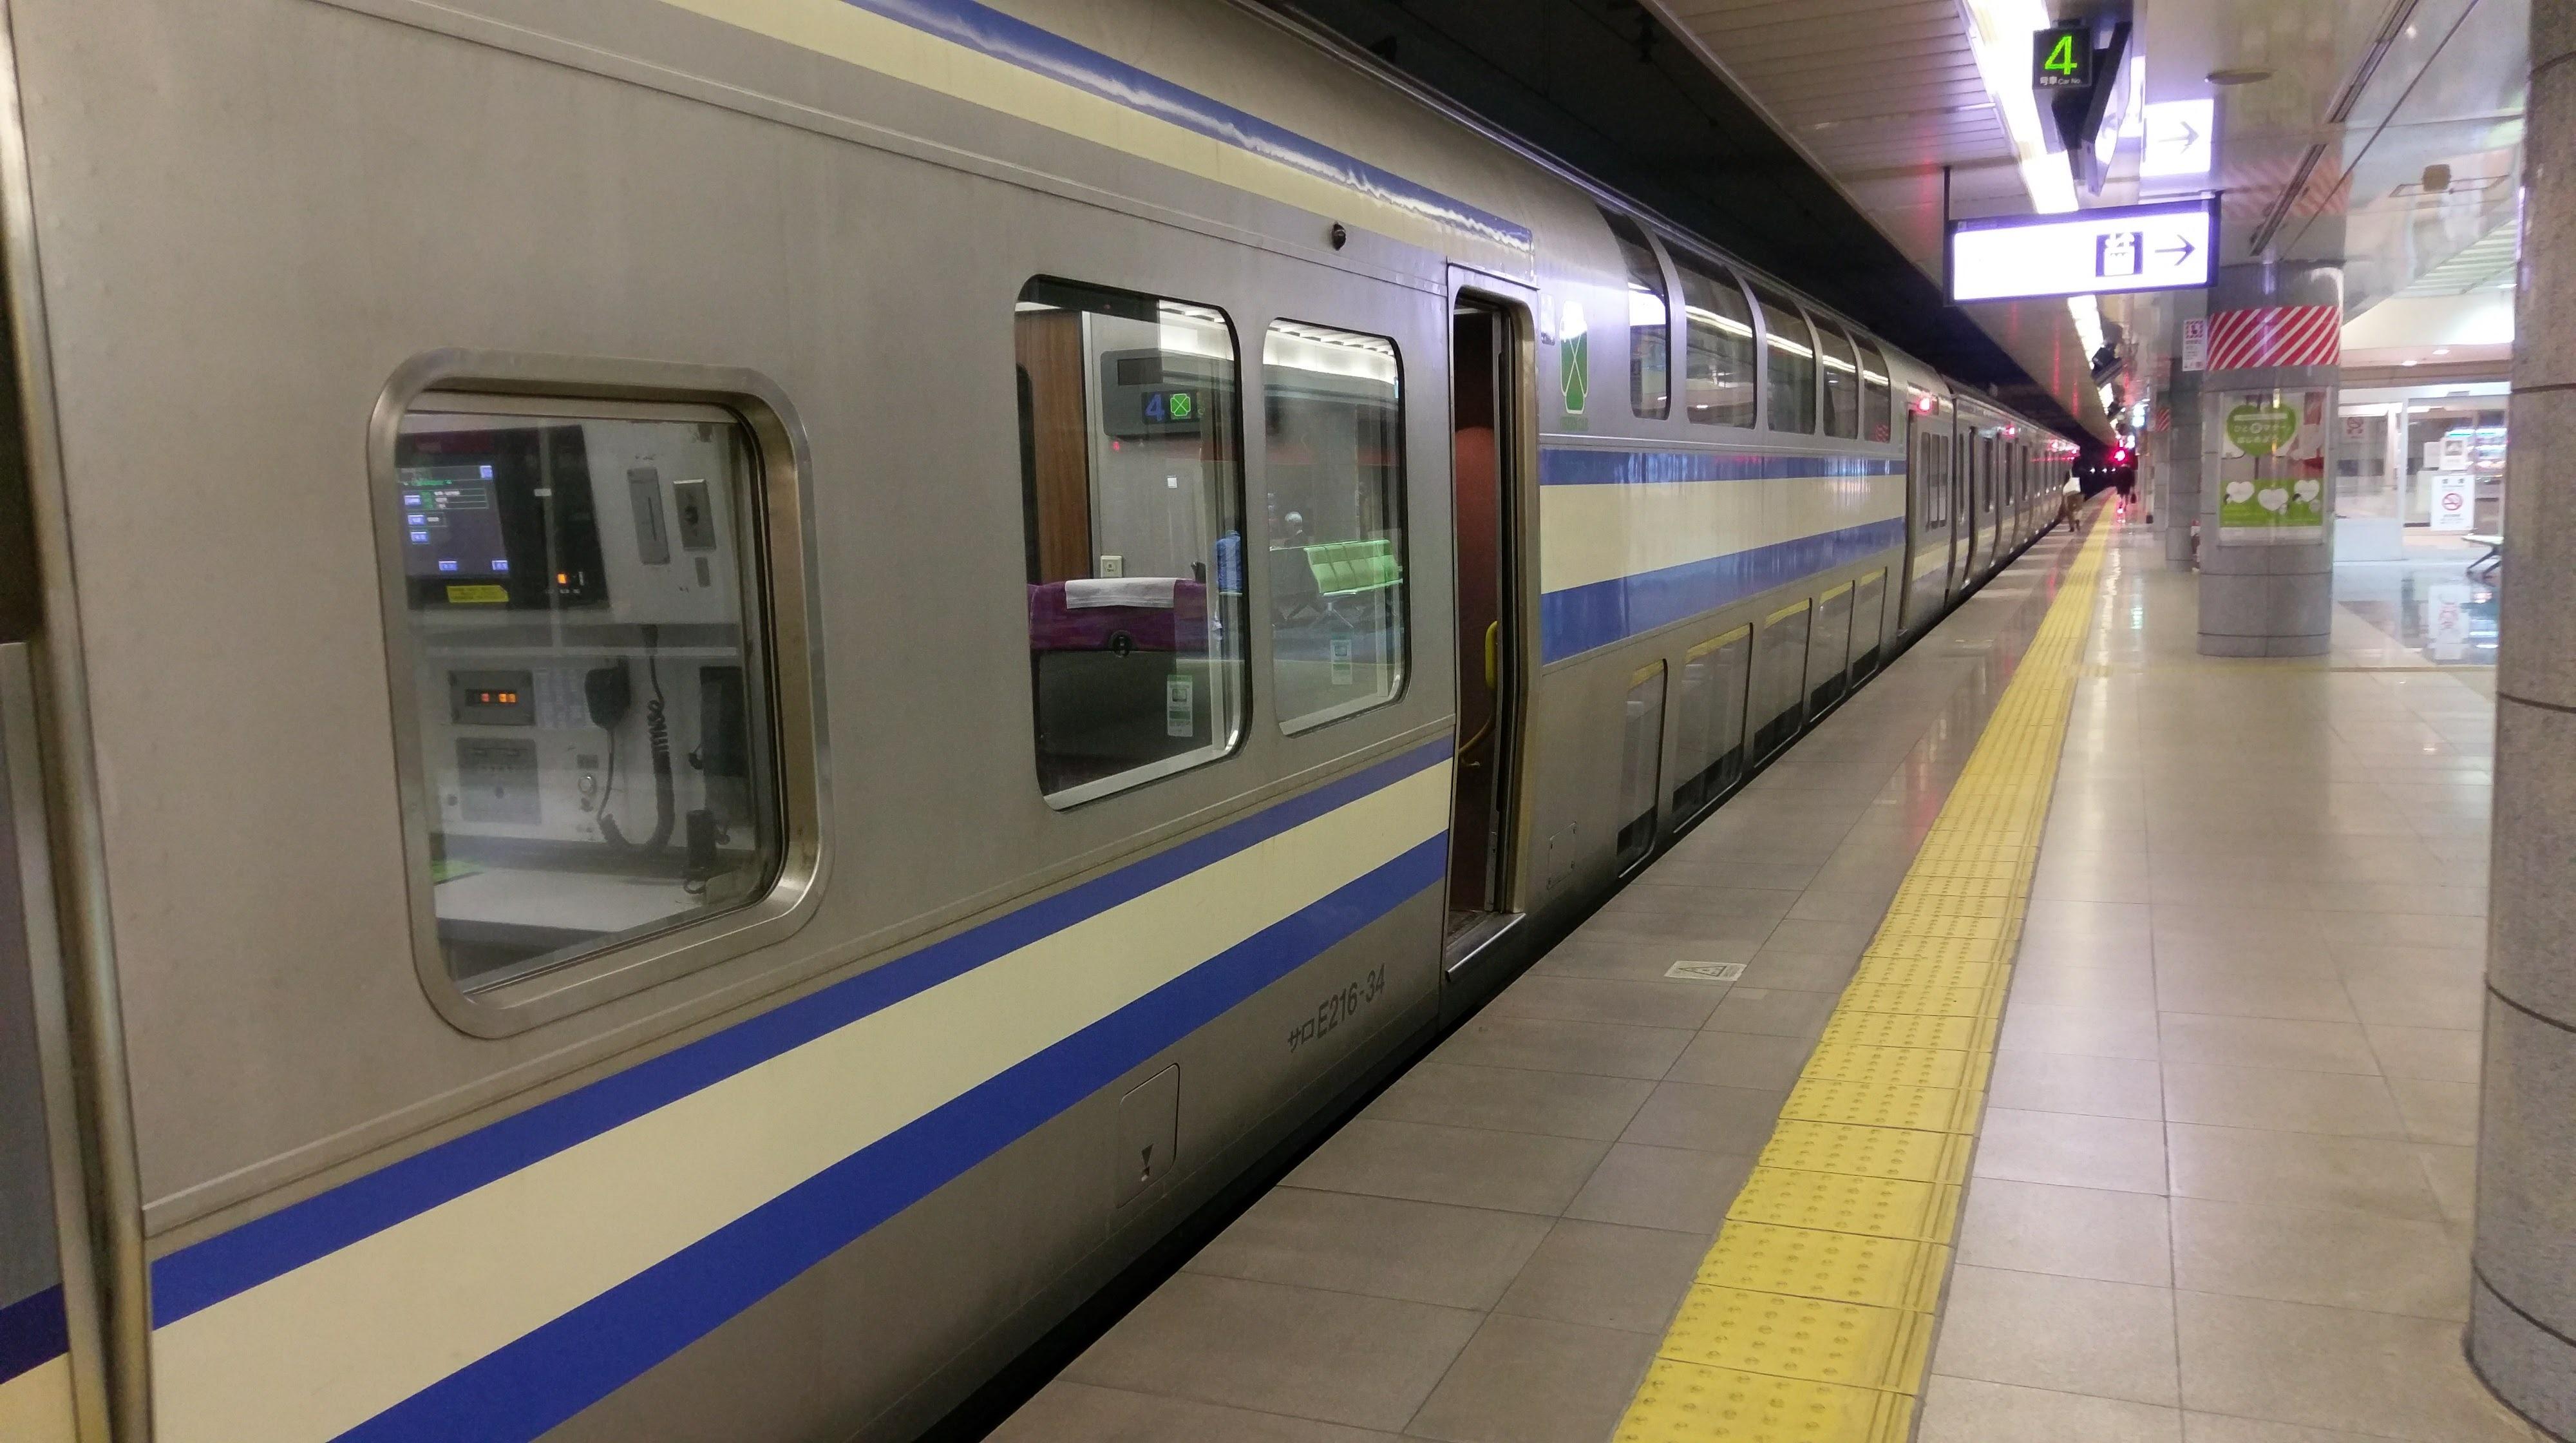 http://aoba-trfc.sakura.ne.jp/sblo_files/aoba-trfc/image/IMAG5141.jpg